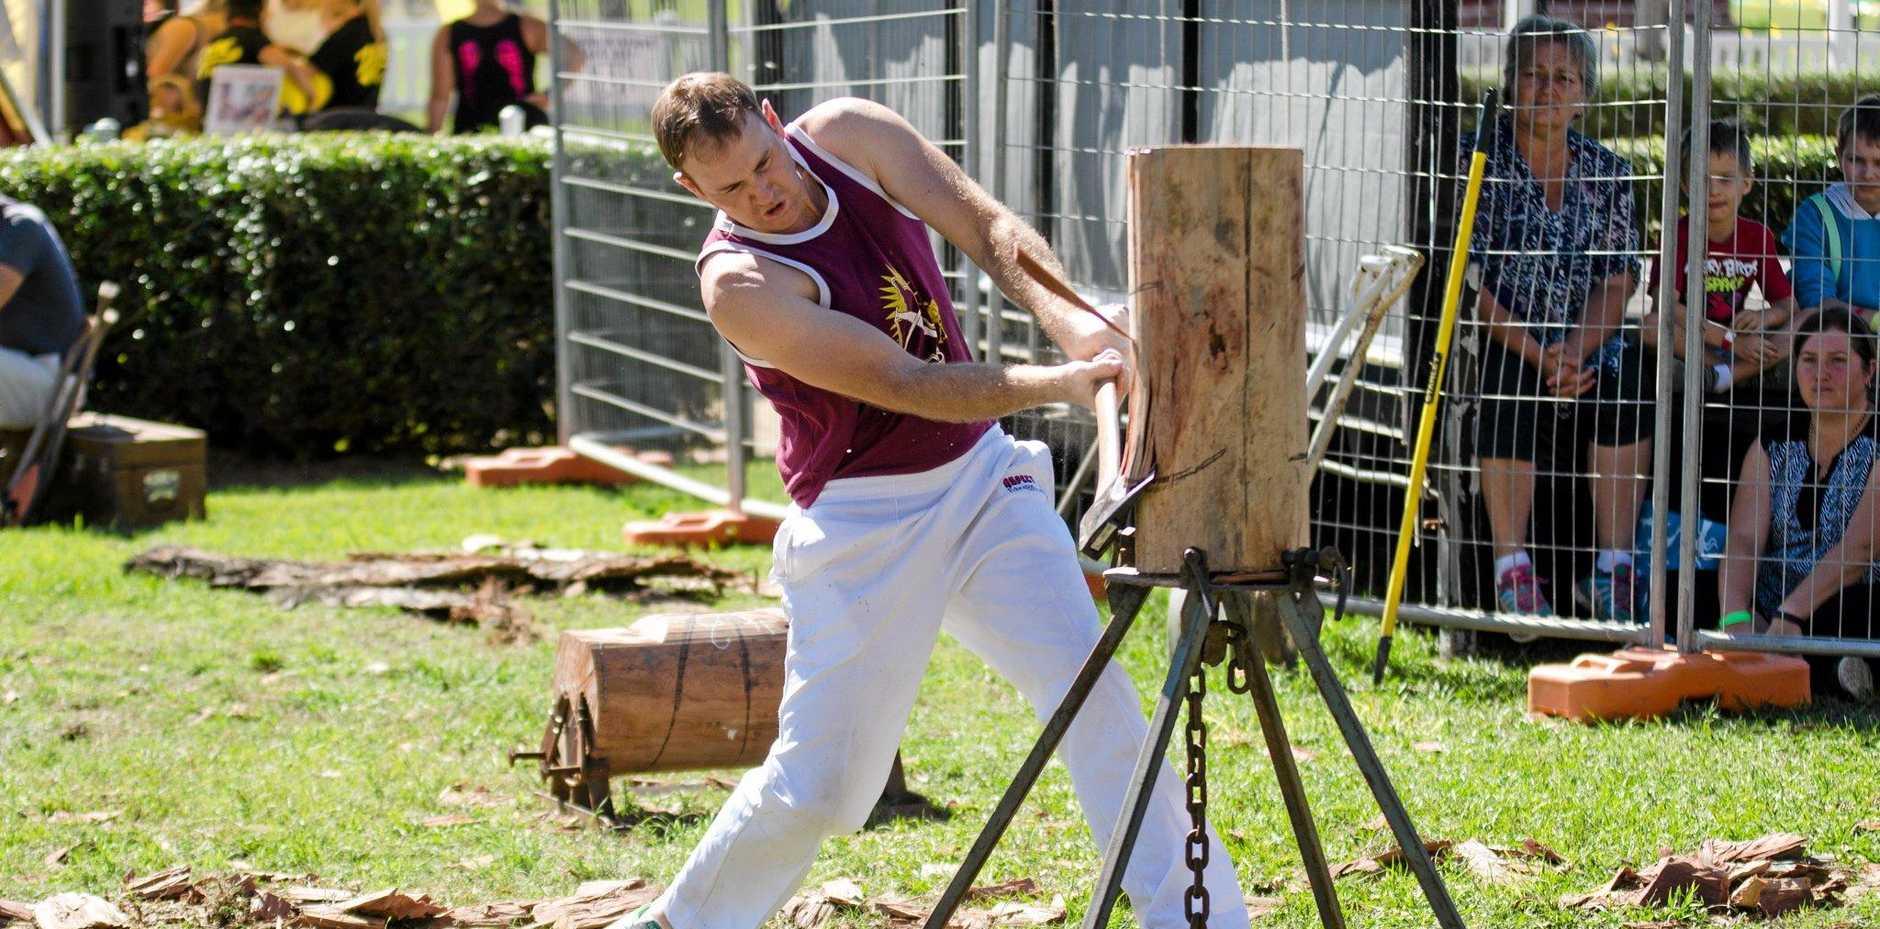 CHOP CHOP: Blake Draper cuts loose at the 2016 Gympie Show wood chop events.